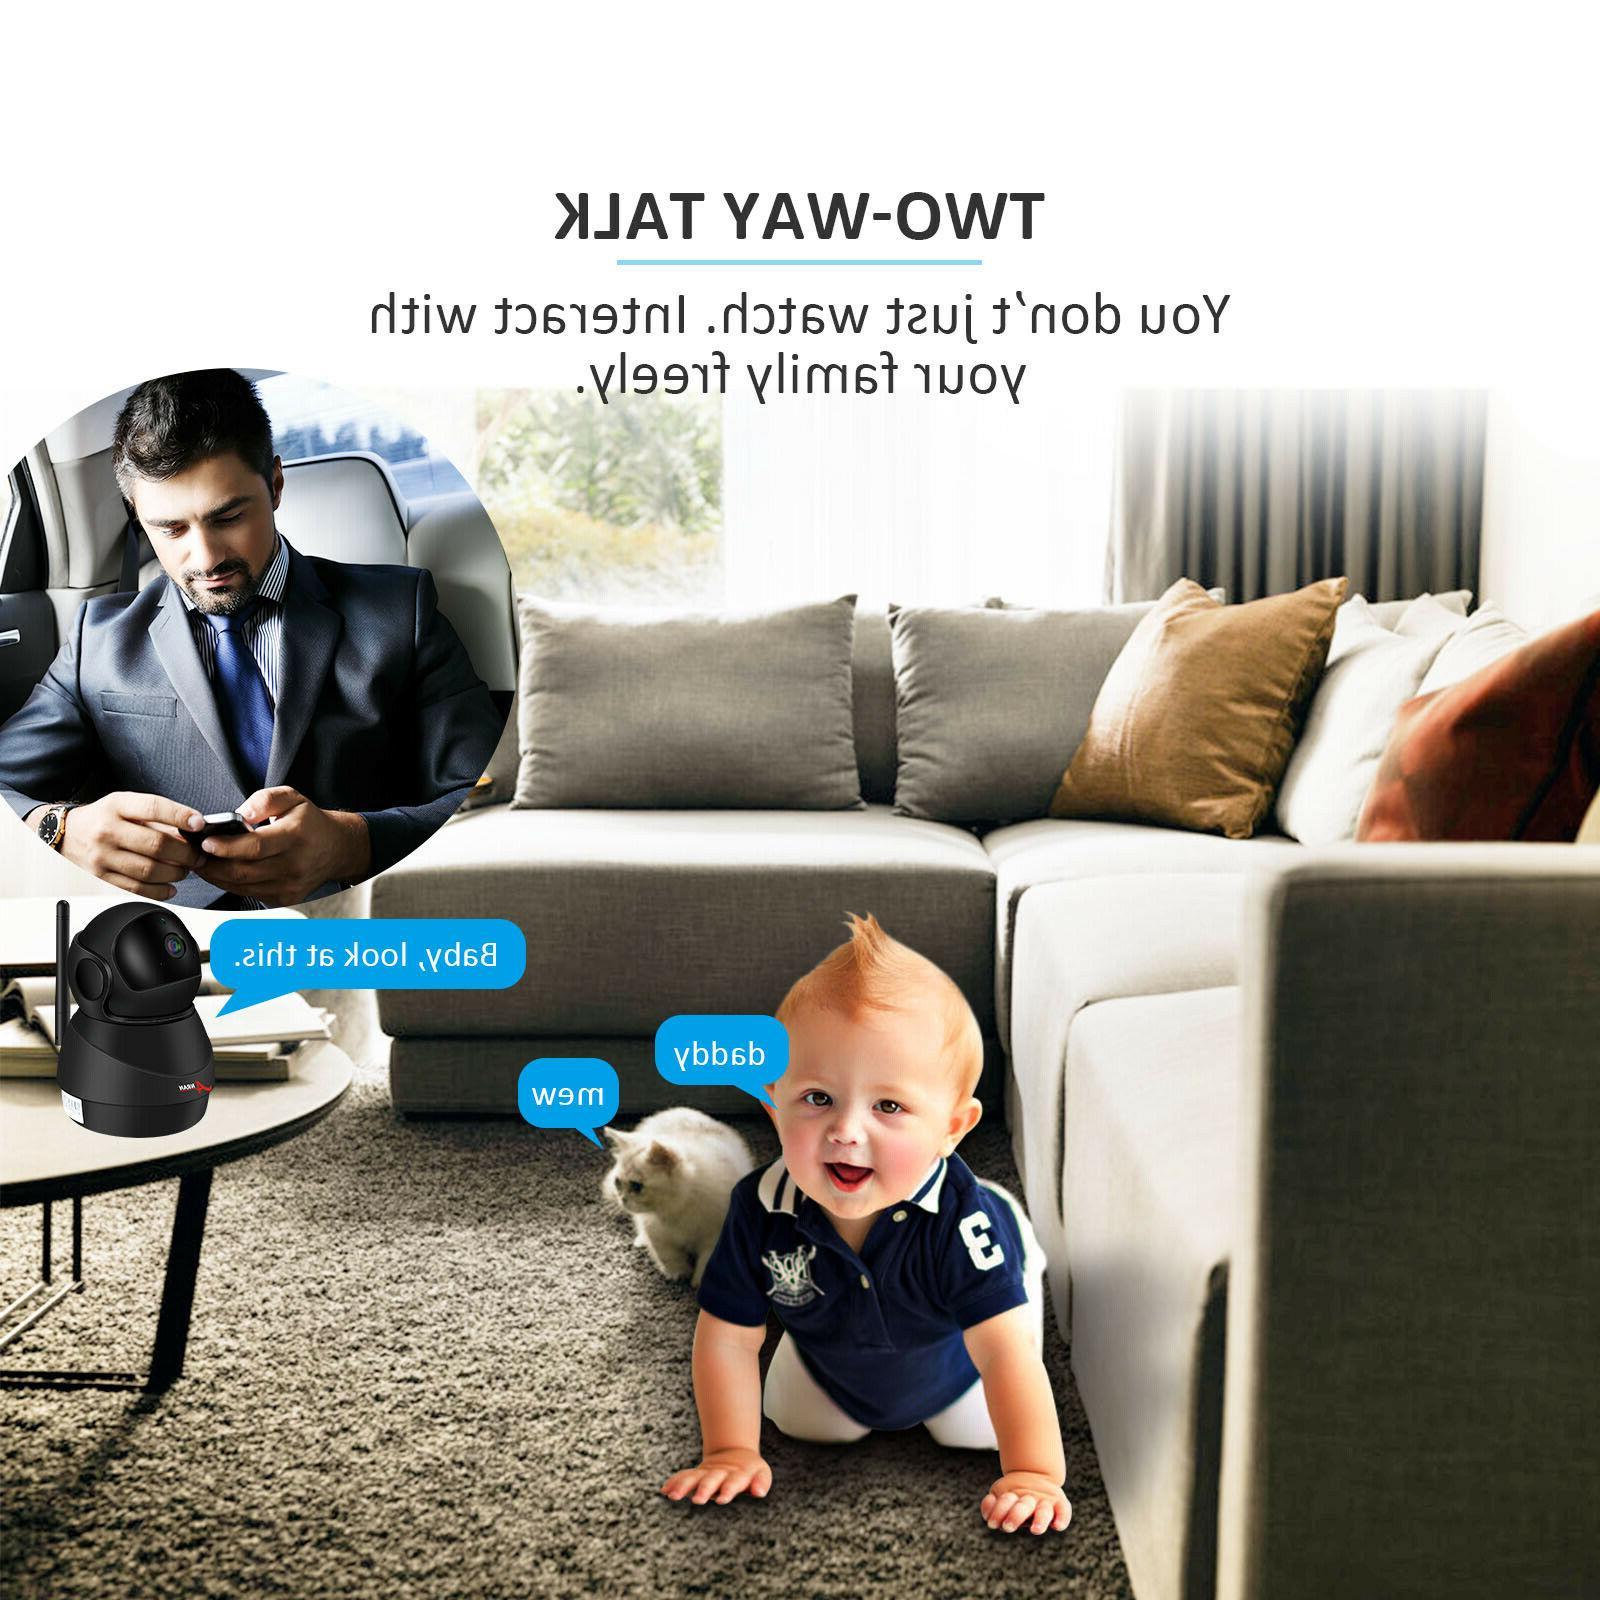 ANRAN 1080P Camera Smart Baby CCTV